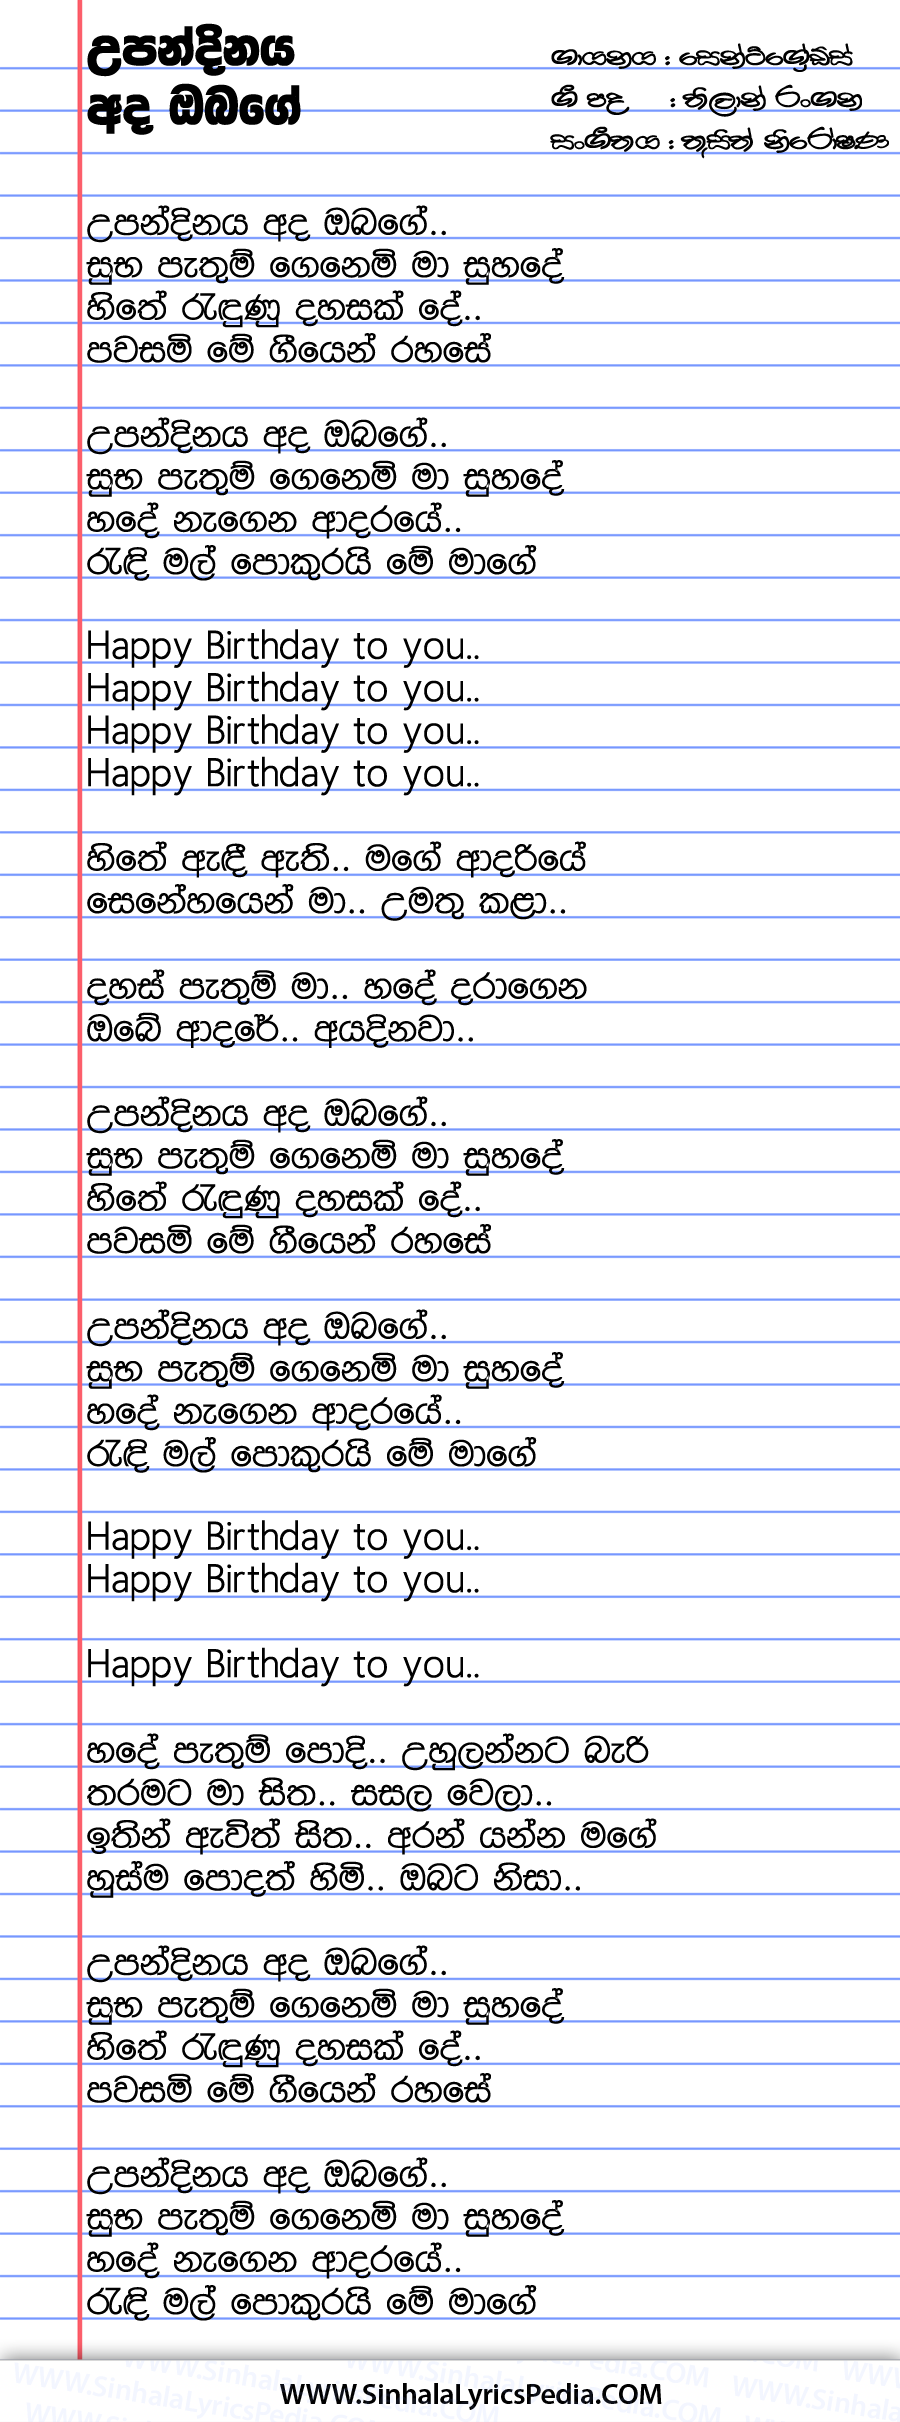 Upandinaya Ada Obage (The Birthday Song) Song Lyrics